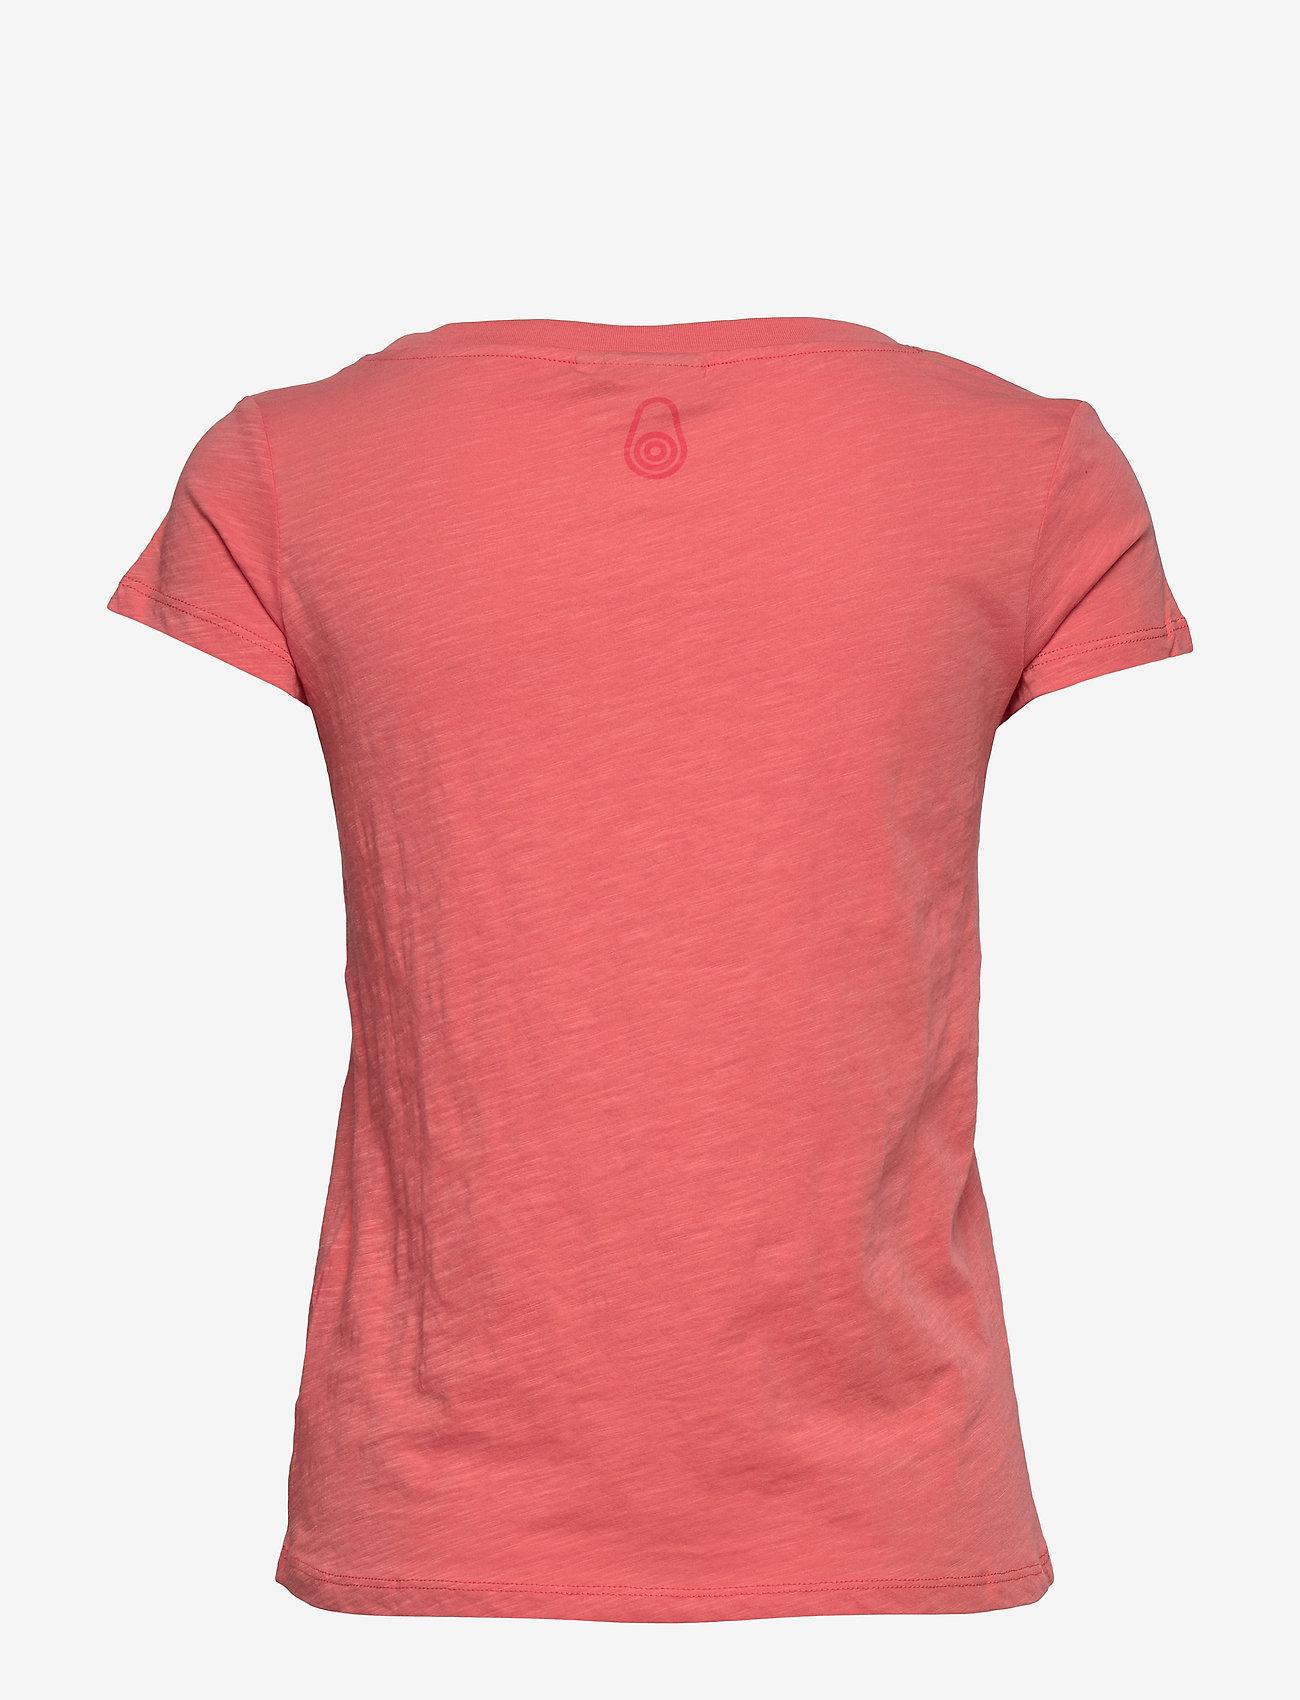 Sail Racing - W GALE TEE - t-shirts - desert flower - 1